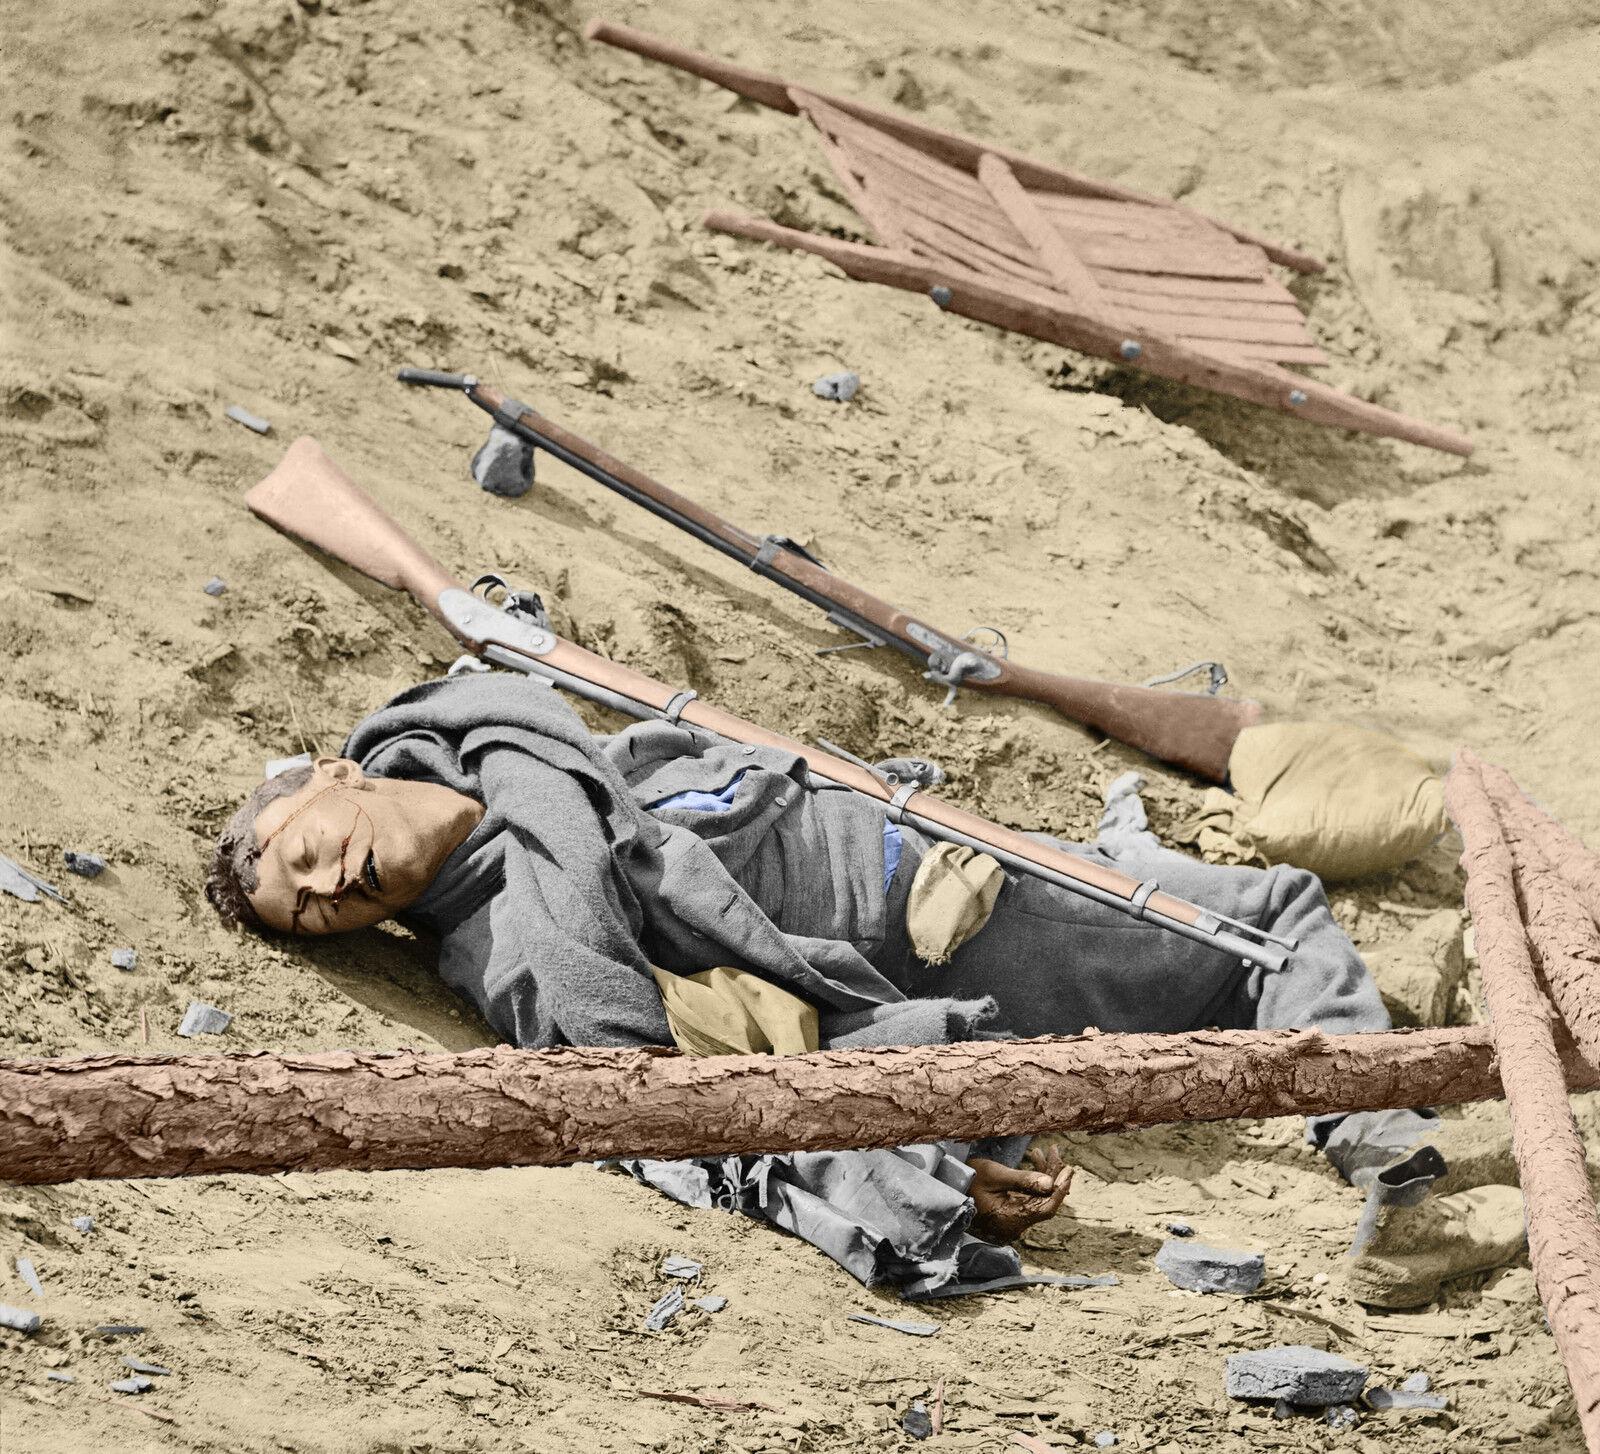 Dead Rebel Soldier Petersburg, VA Farbe Tinted photo Civil War 02539